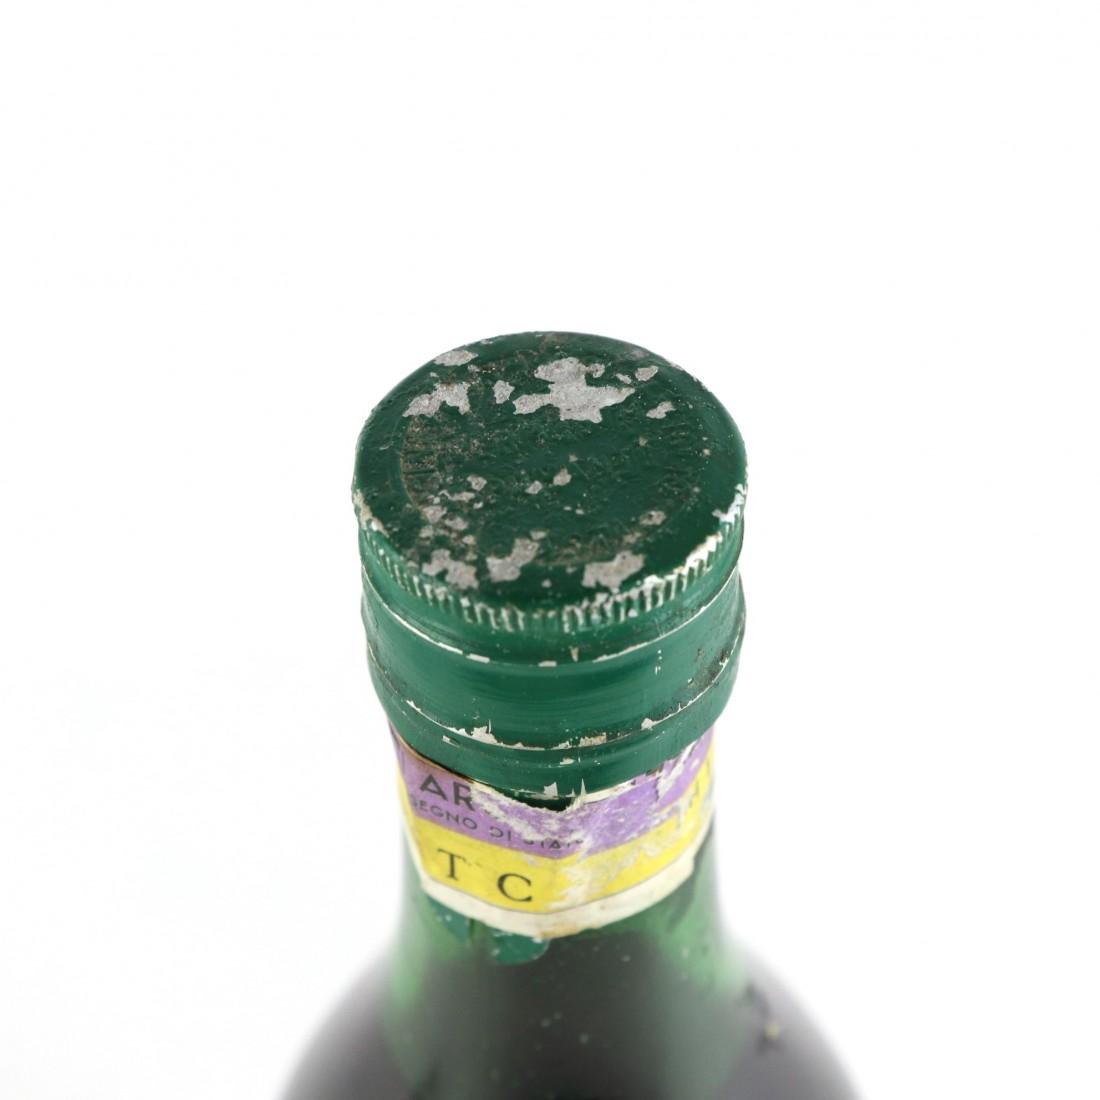 Poncini Vermouth 1 Litre